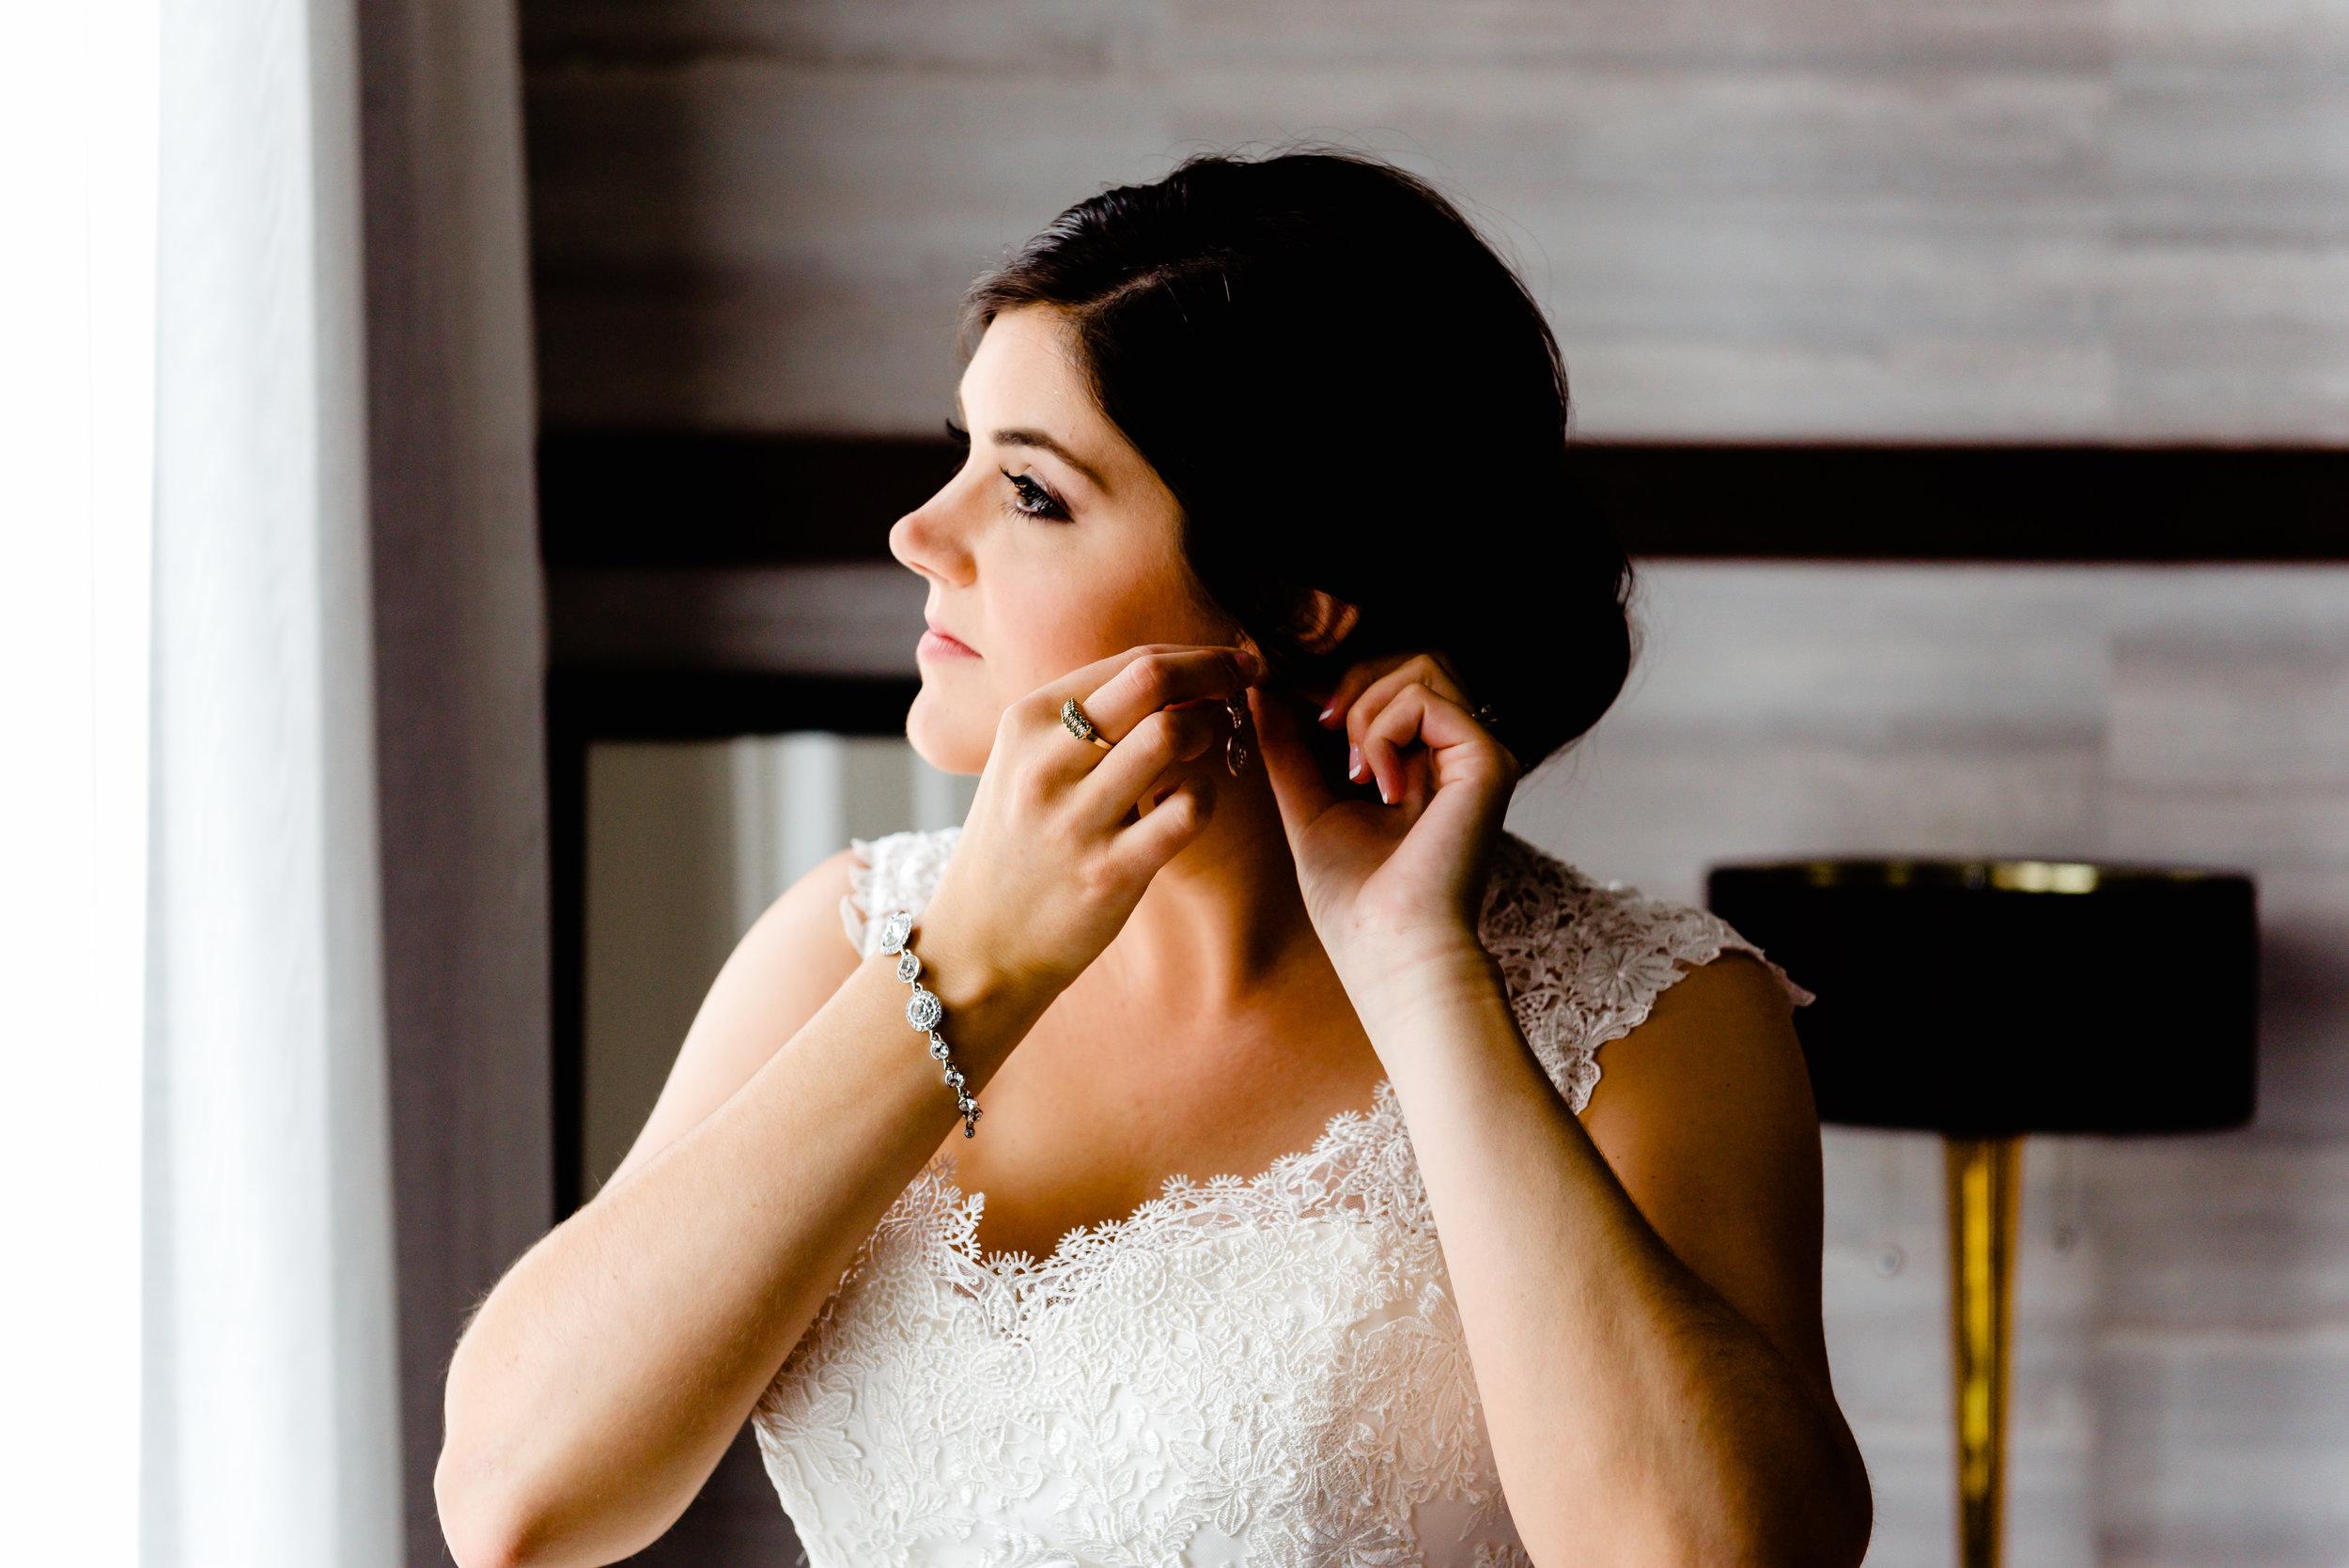 Hotel Ivy Wedding - Bride in Bridal Suite  - Minneapolis Romantic Wedding Photographer